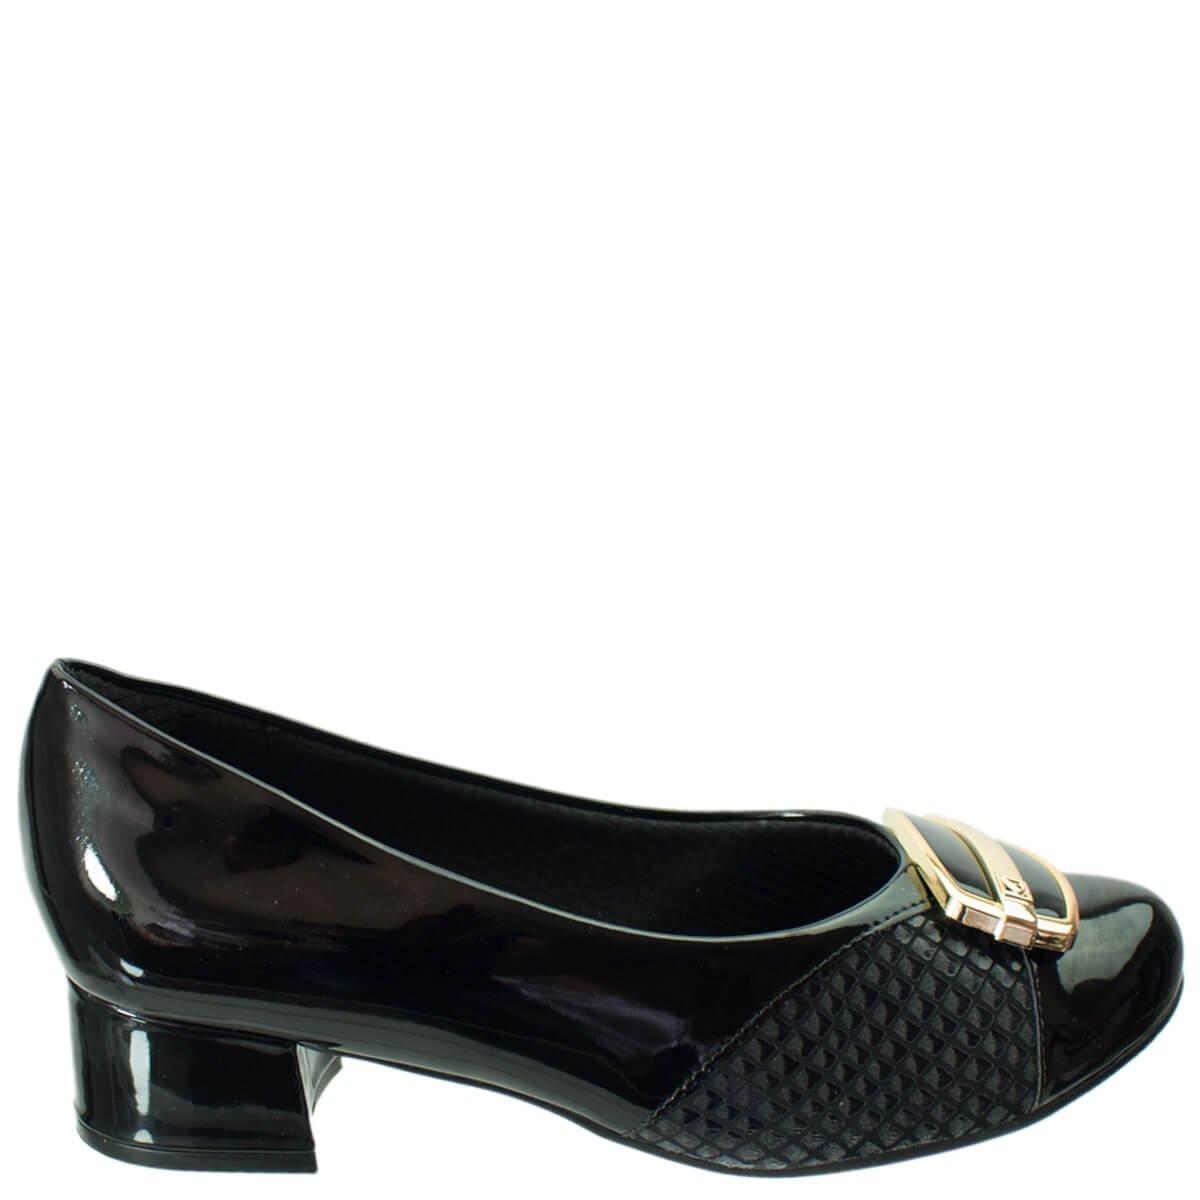 6eb7153cd6f2f Bizz Store - Sapato Feminino Piccadilly Joanete Verniz